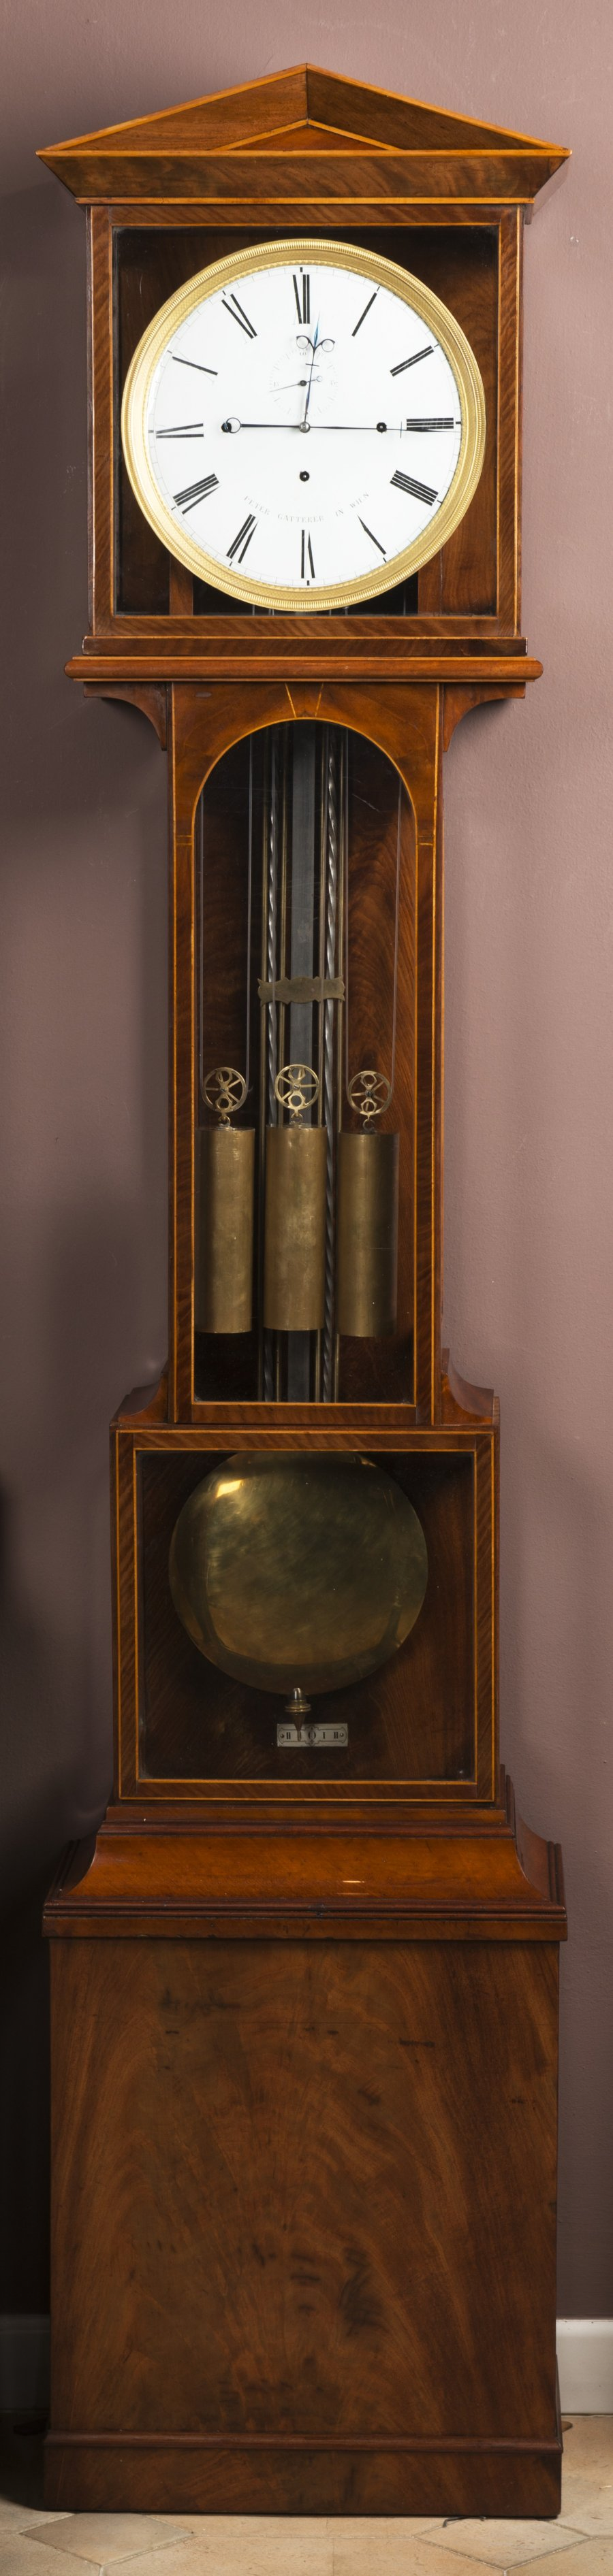 A LANTERN GRANDFATHER CLOCK